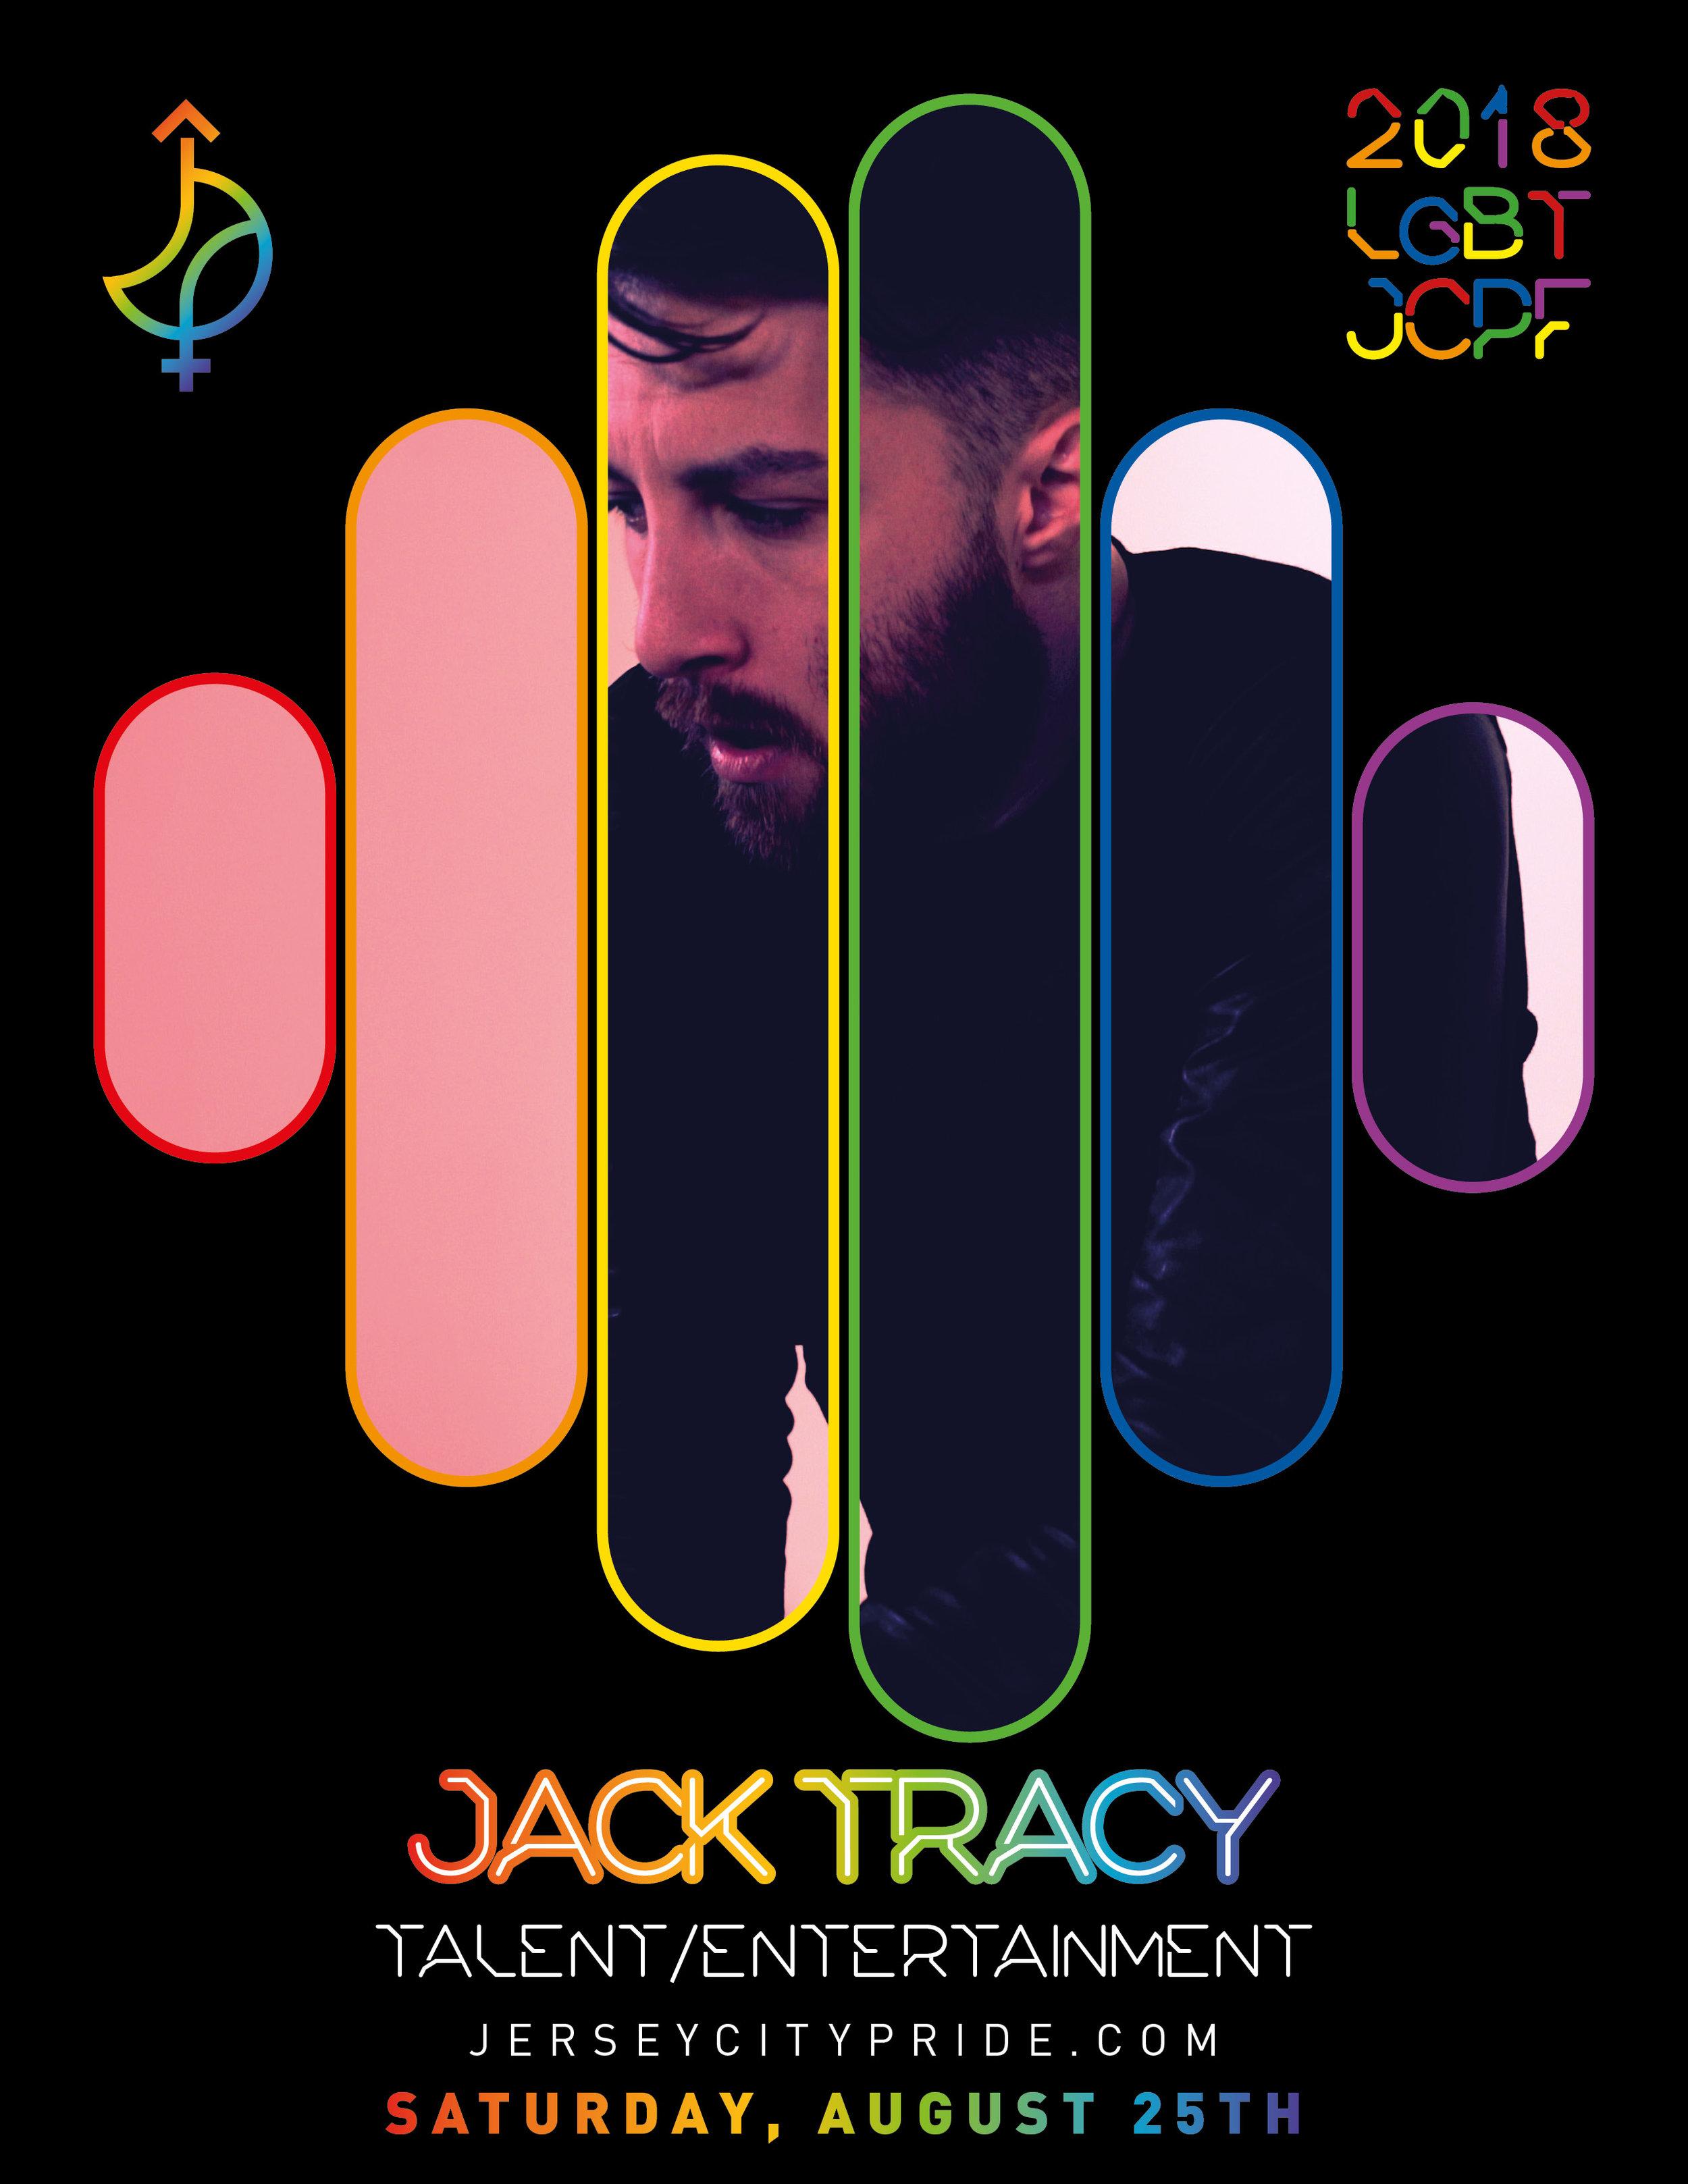 jack tracy.jpg